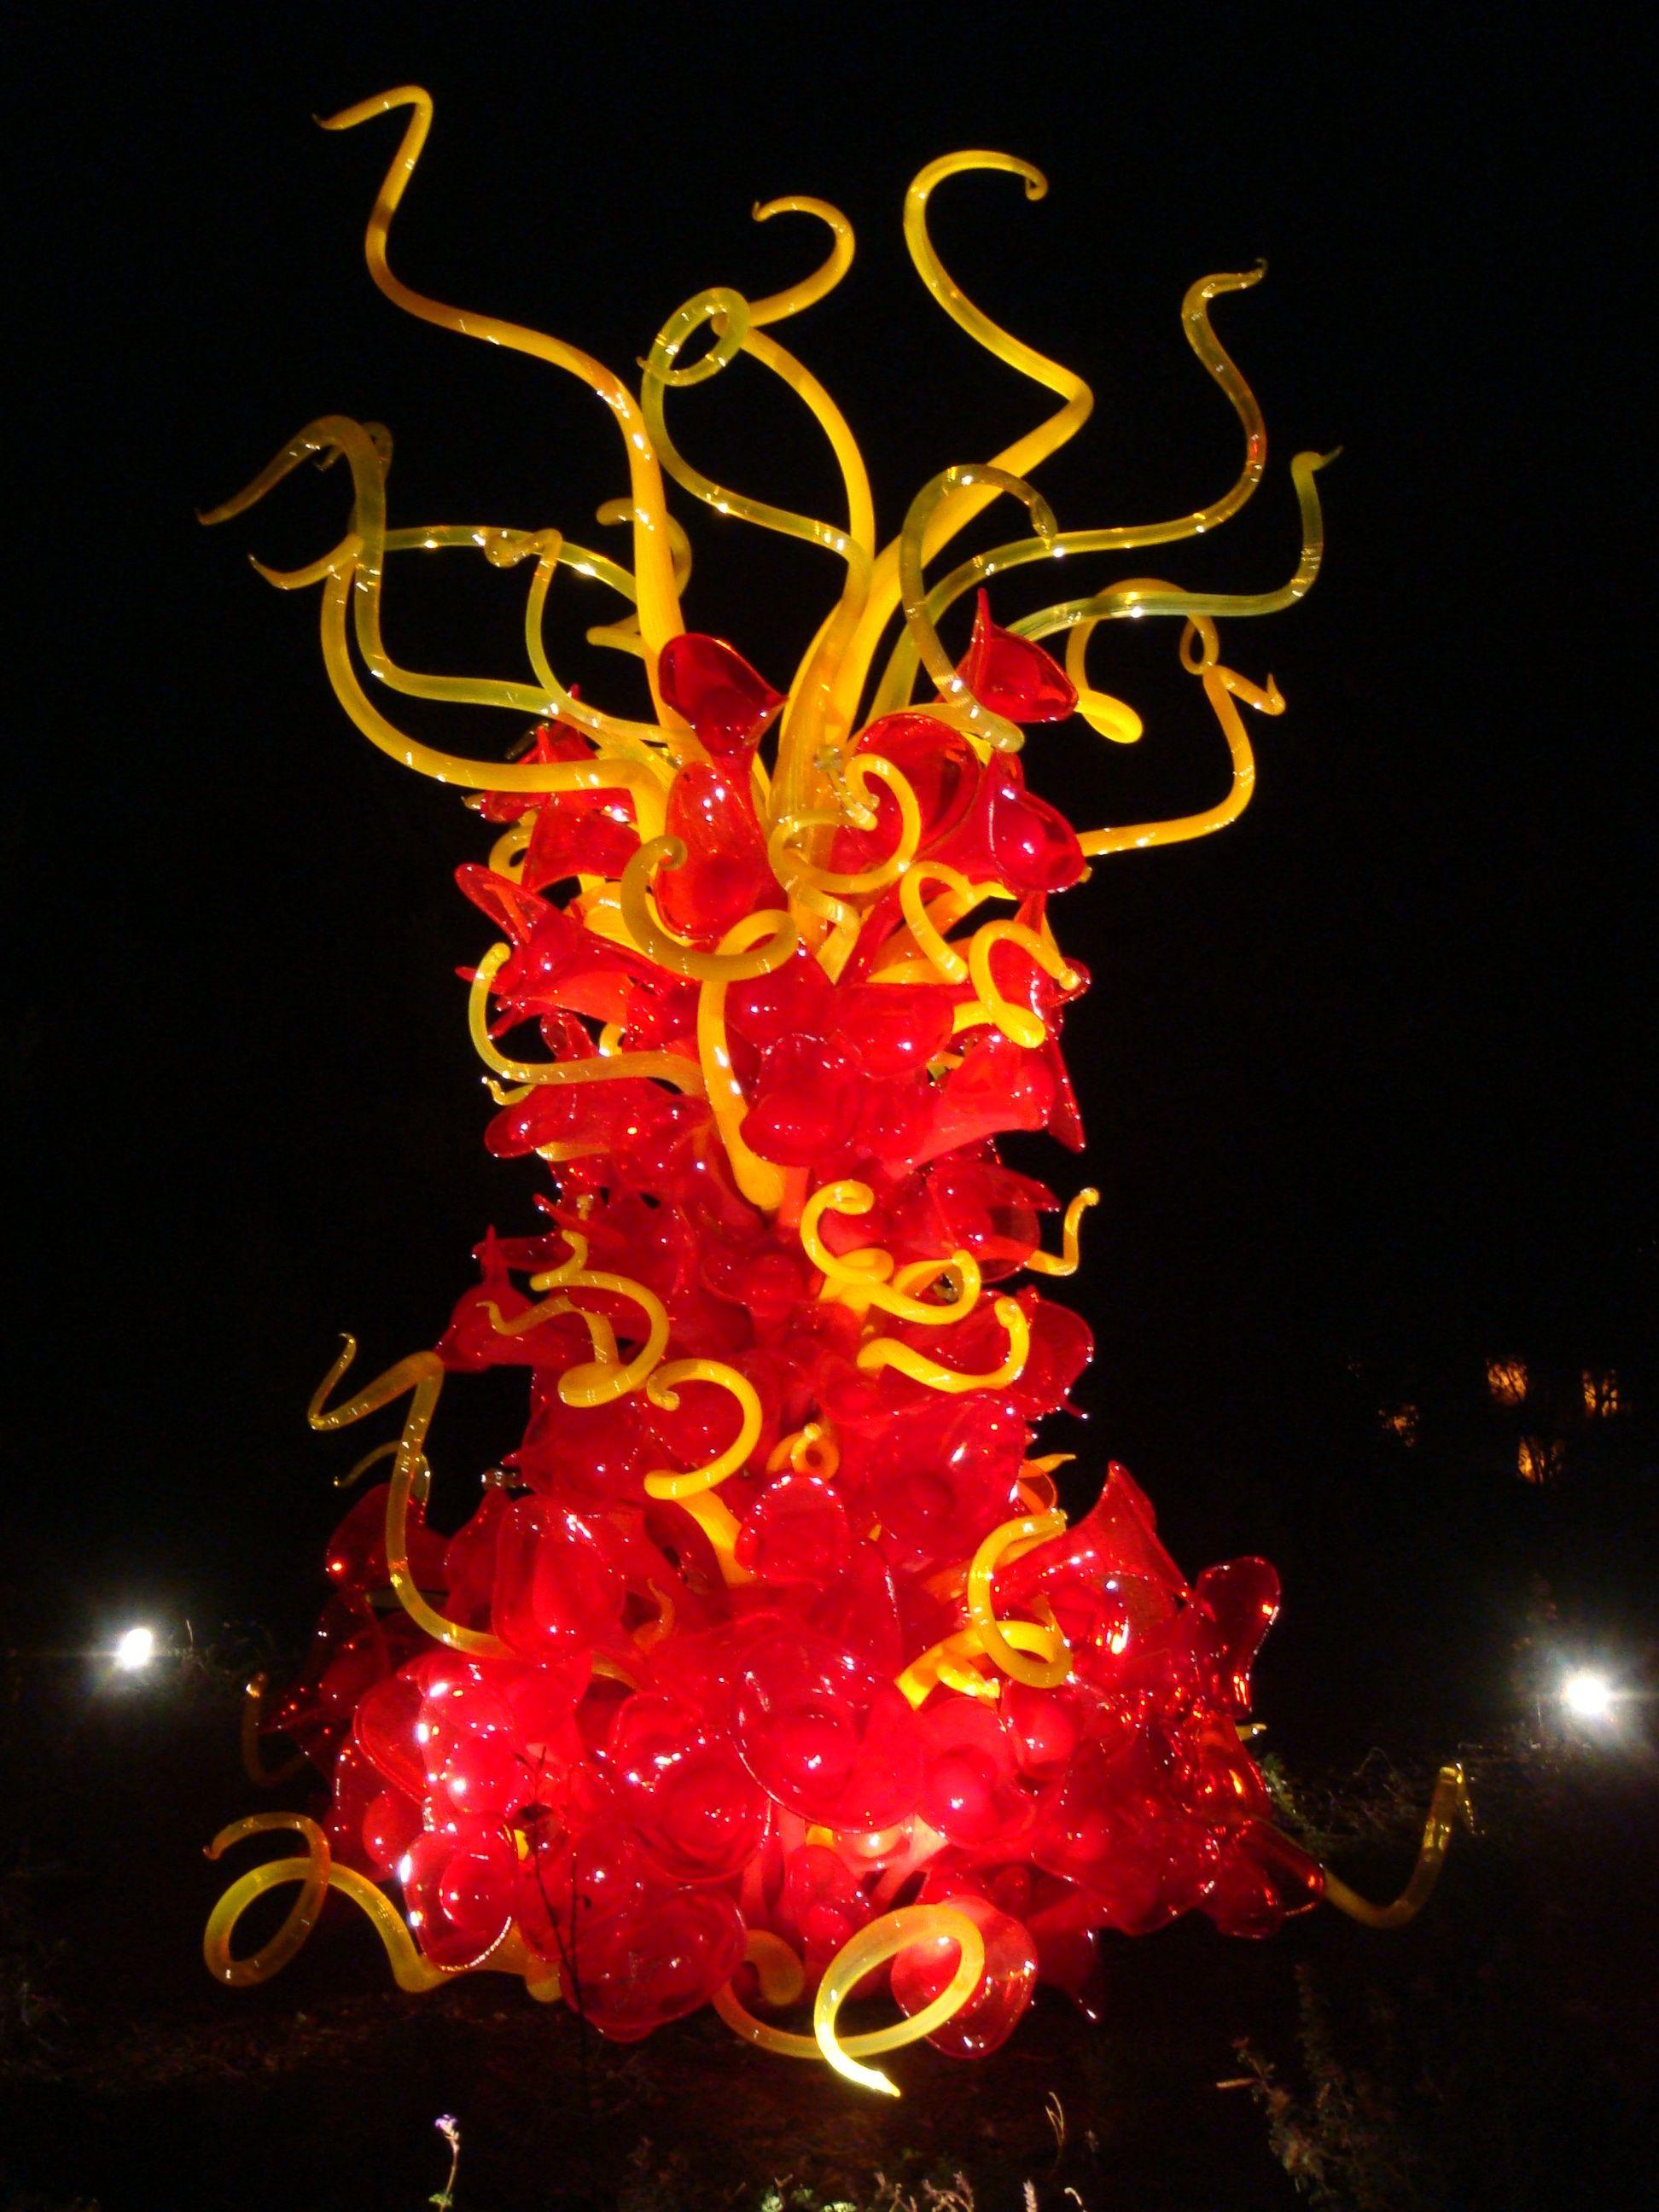 Dale Chuhuily sculpture for Desert Botanical Gardens